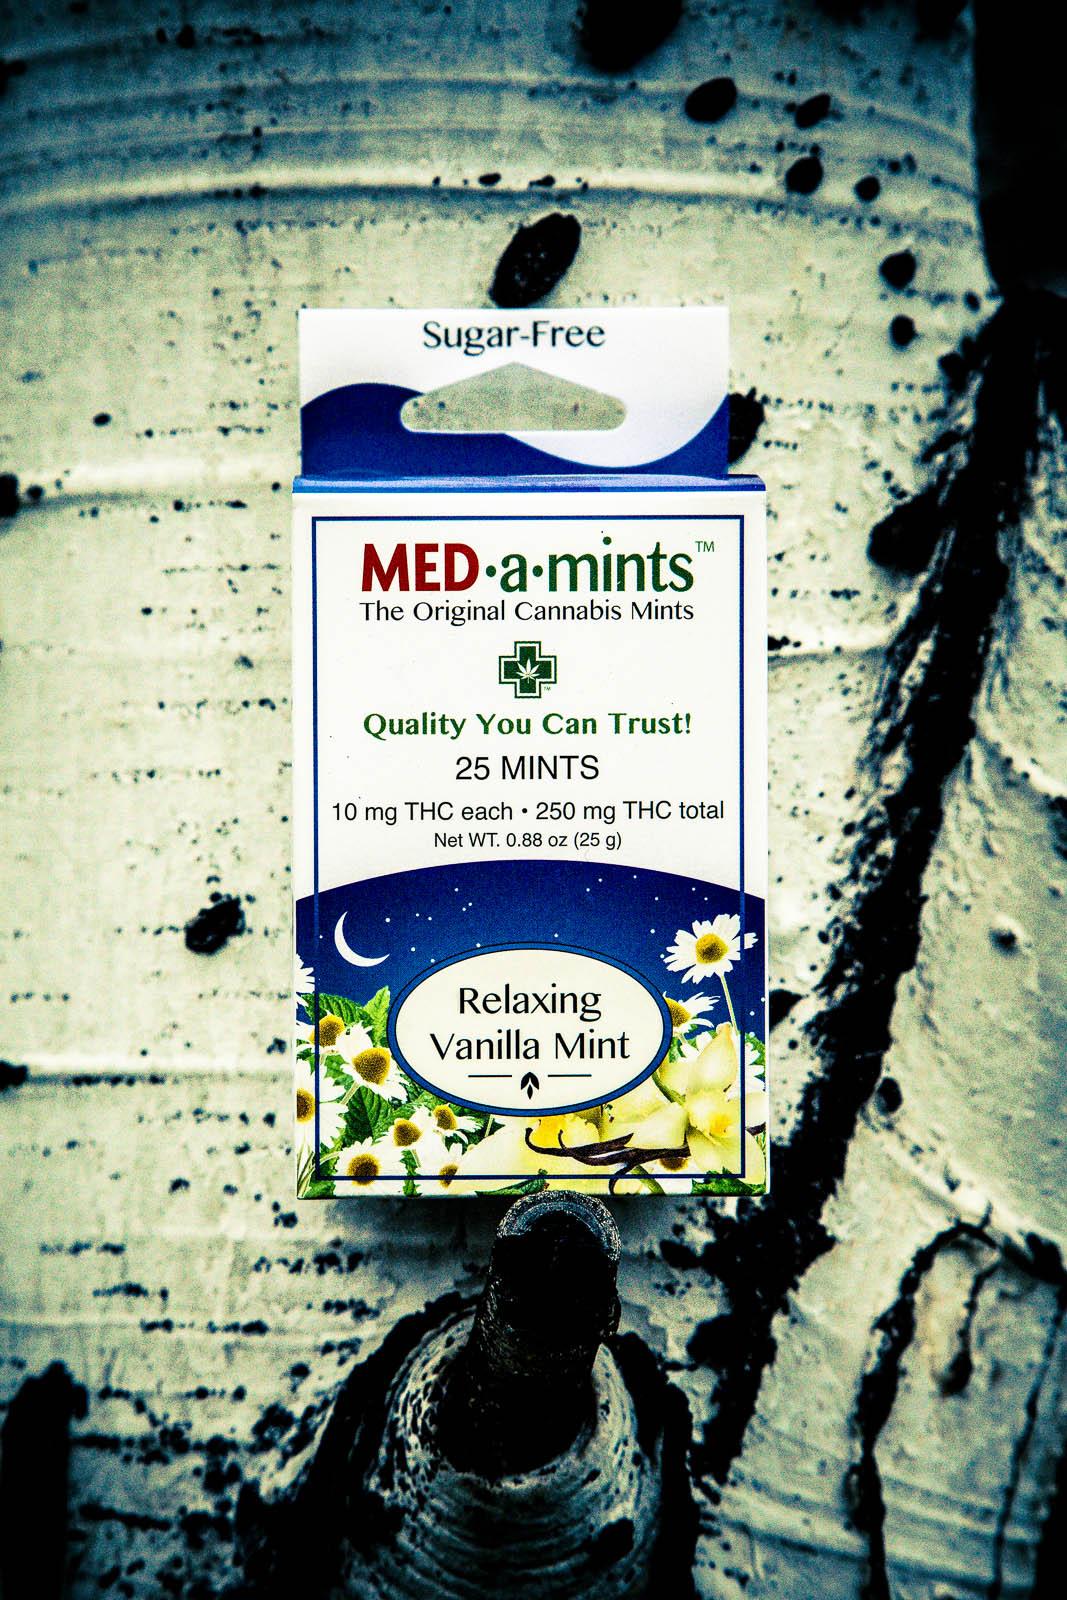 medamints-potent-thc-cannabis-marijuana-mints-047